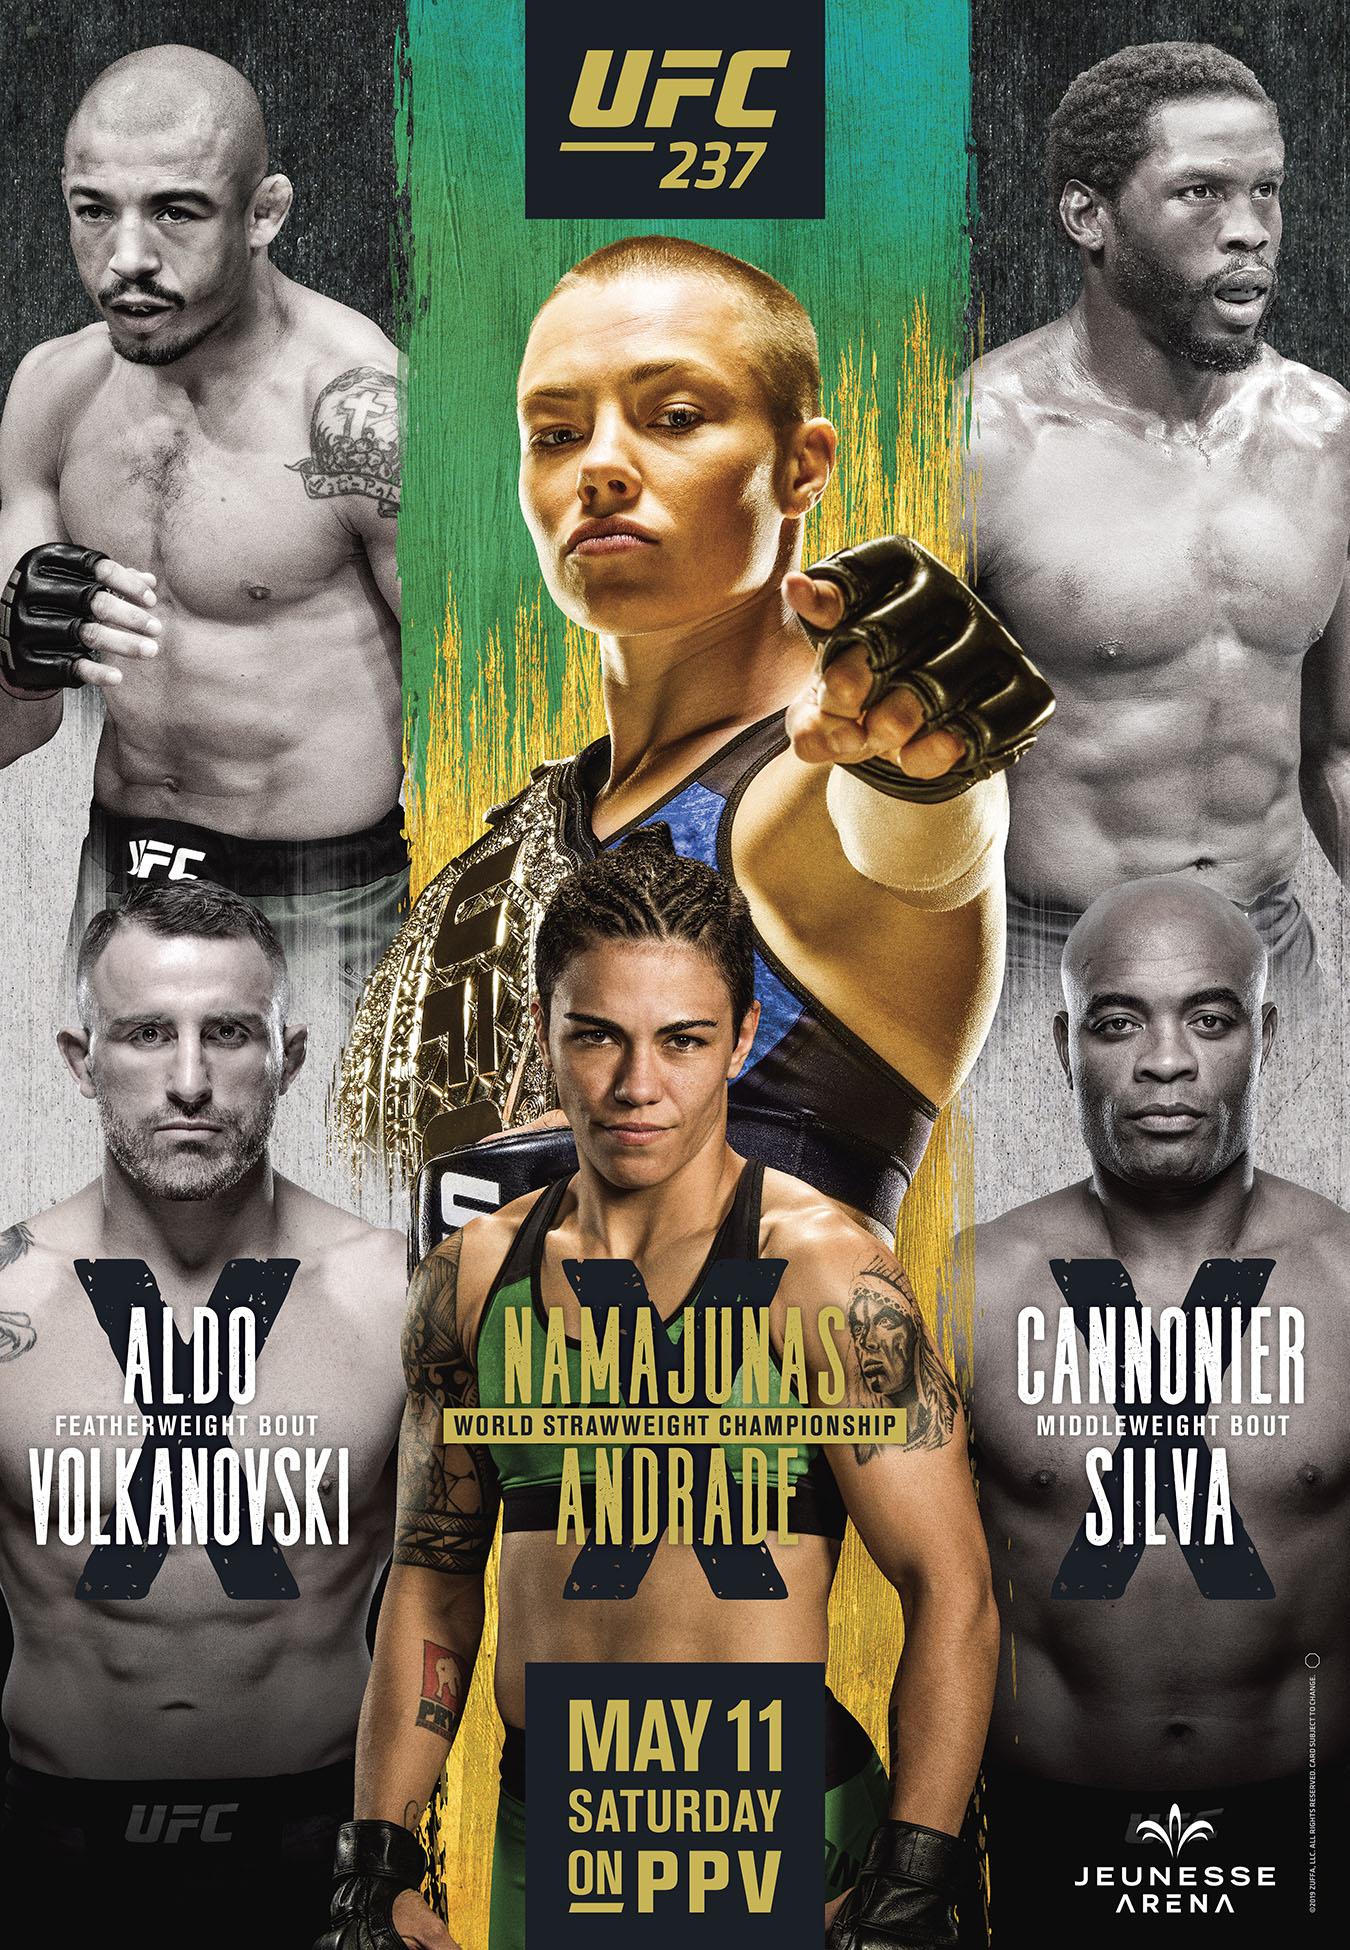 UFC_237_poster_english_small.jpg